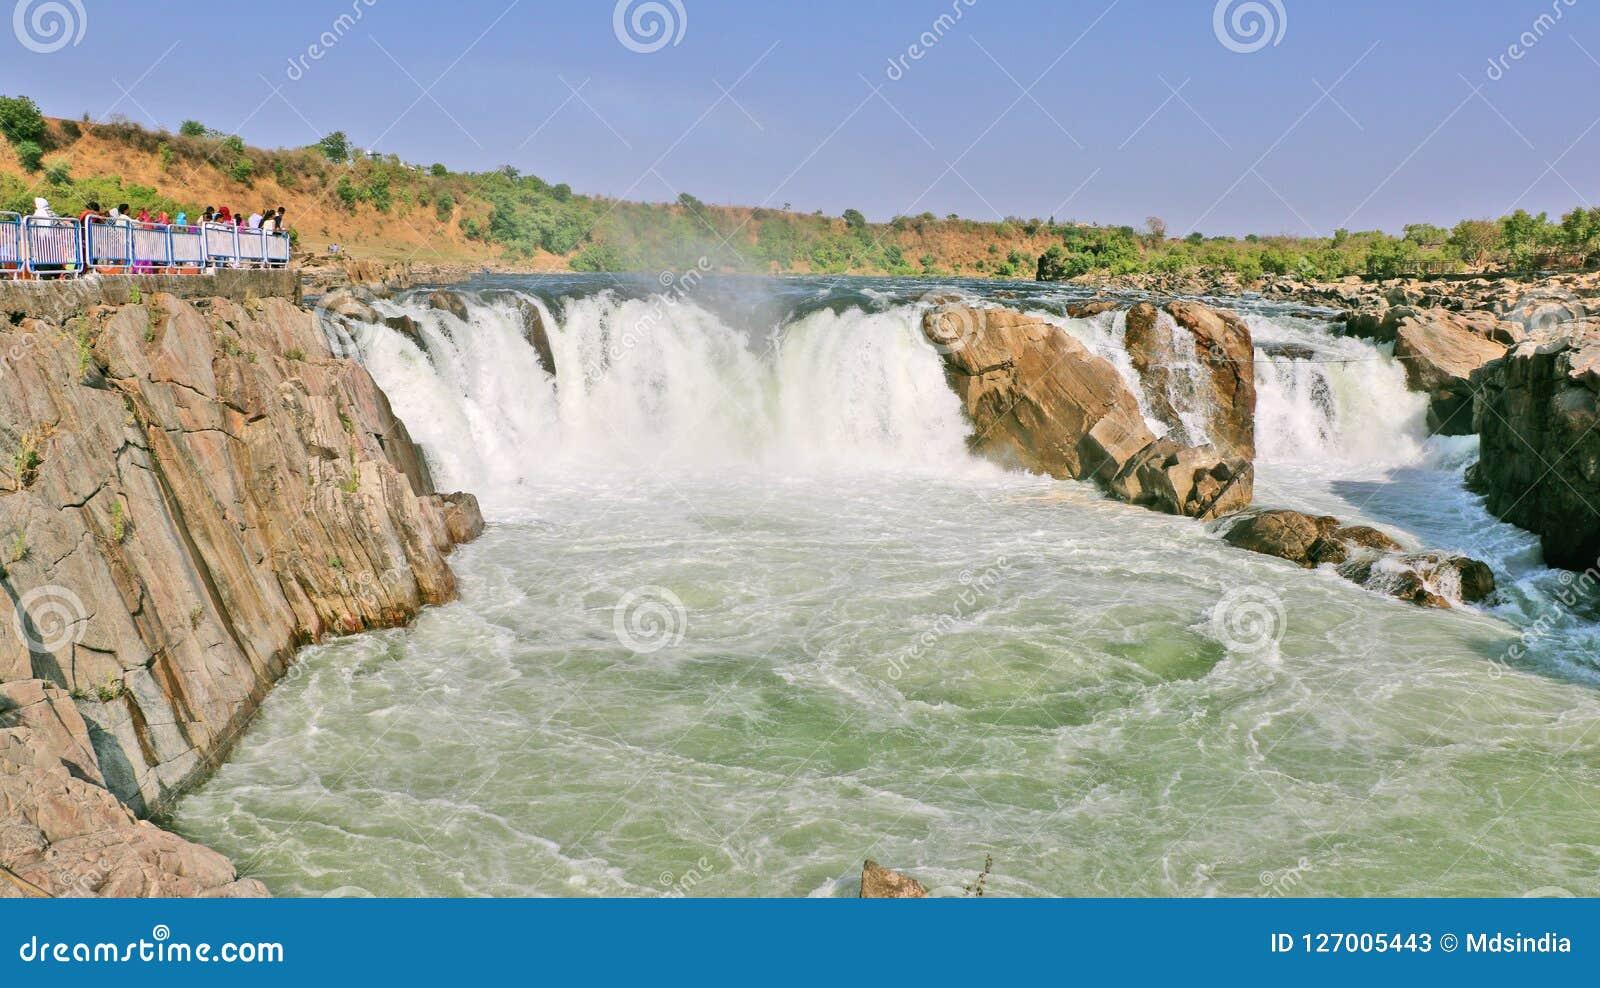 Cascada de Dhuandhar en el río de Narmada en Jabalpur